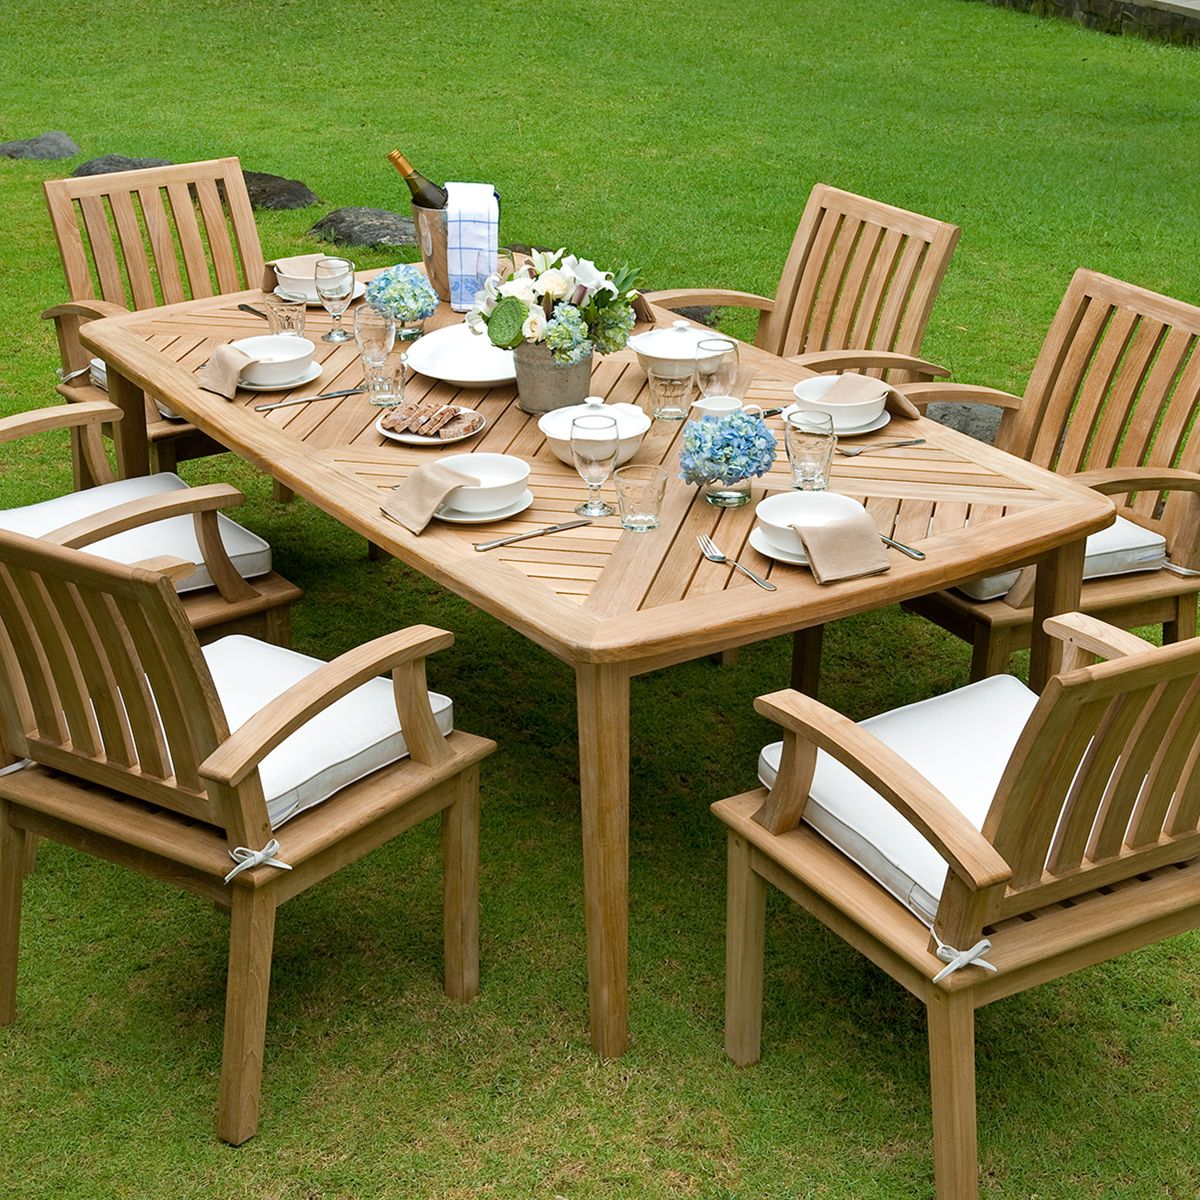 Veranda Dining Table In 2019 Cdj Hilton Head House Dining Teak